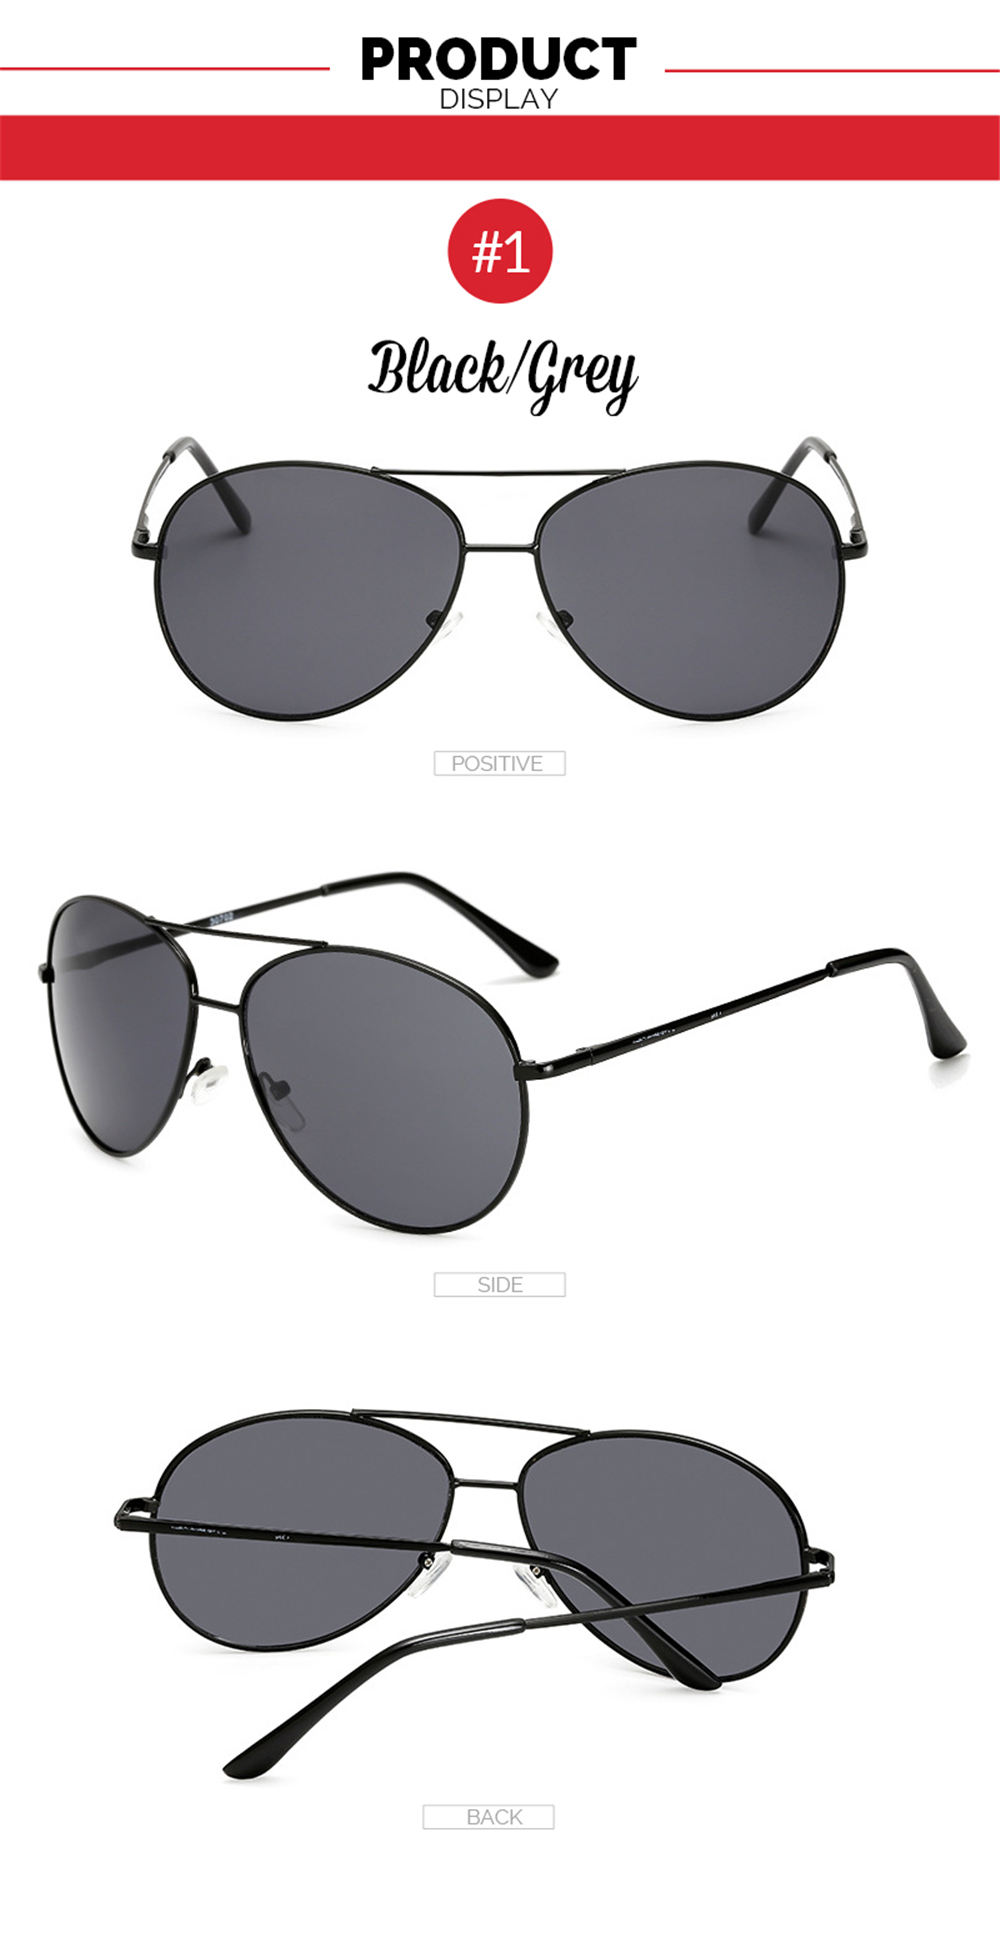 e8bc64cb09b VIVIBEE SaltBae Like Round Vintage Fashion Sunglasses for Women and Men  UV400 Colorful Leg Sun Glasses 2019 TrendUSD 3.99